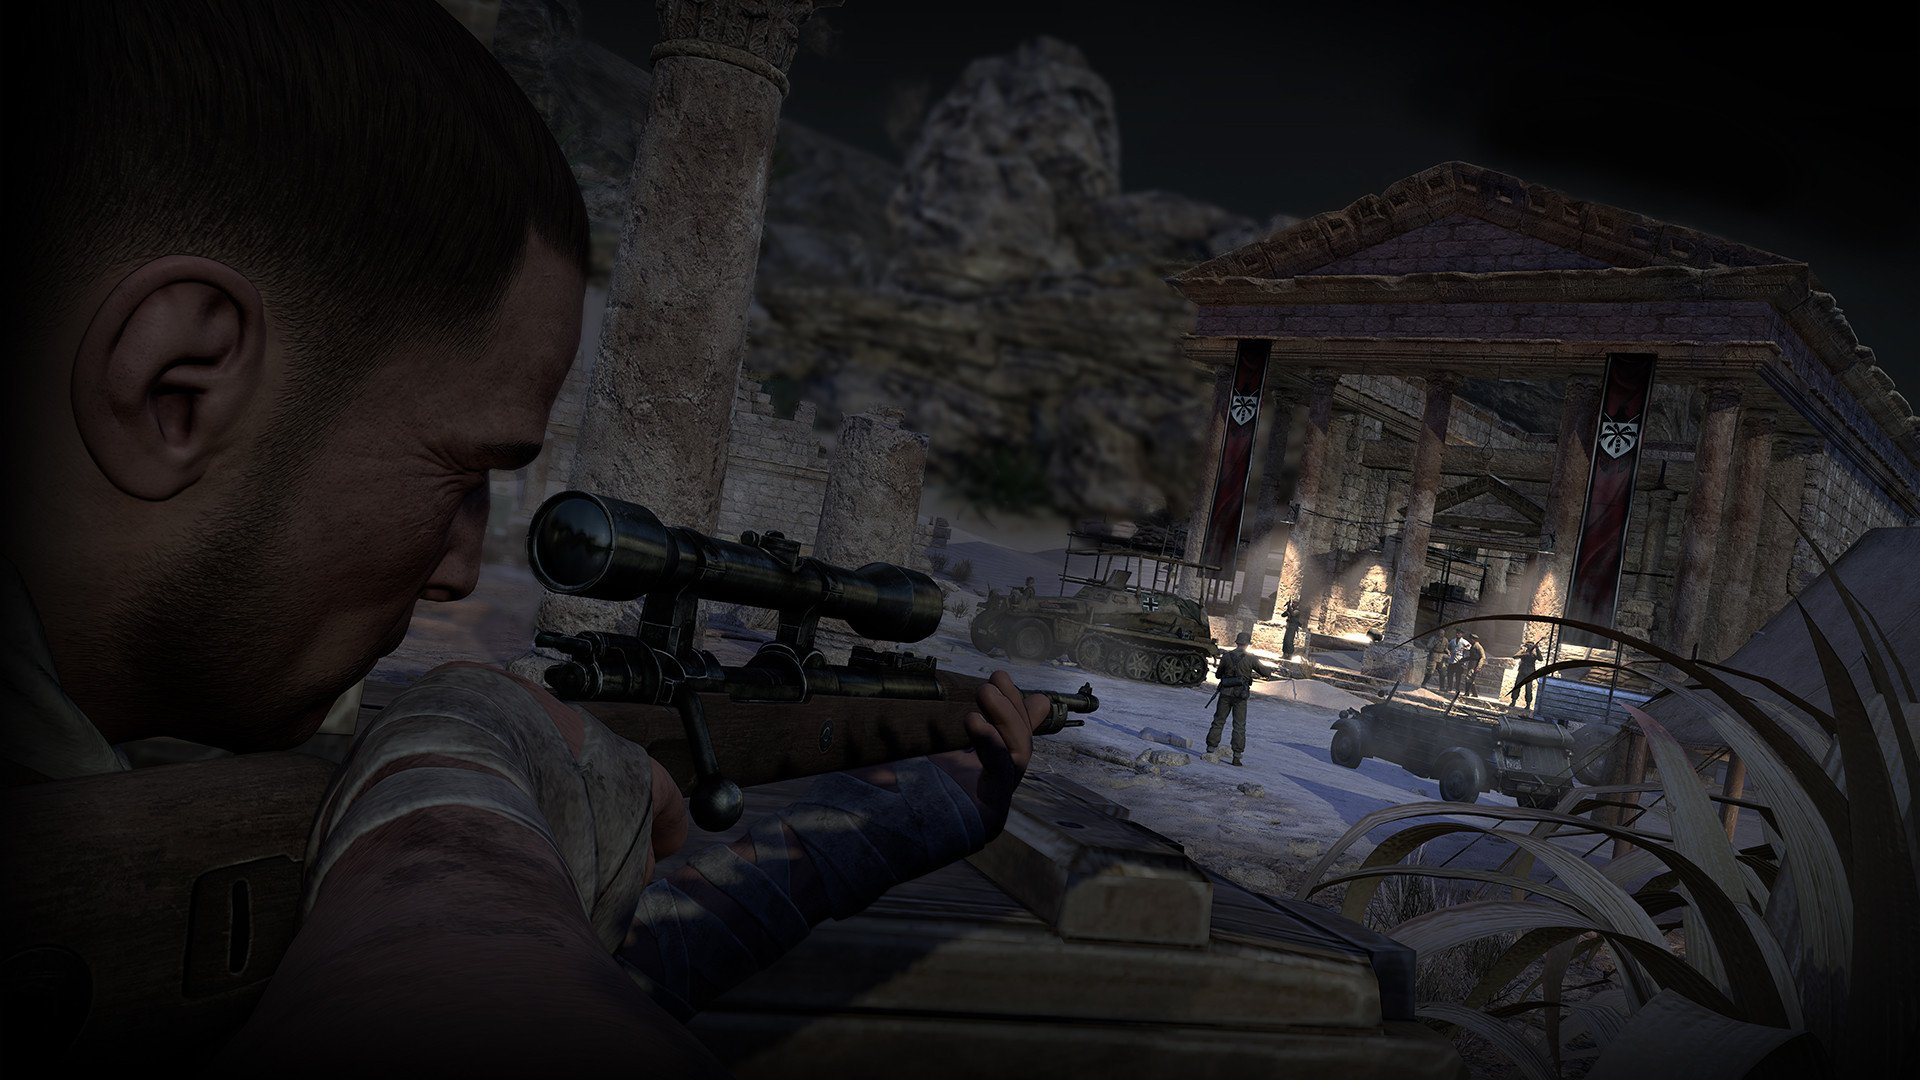 sniper elite 3 2537601 تصاویر جدیدی از Sniper Elite 3 منتشر شد : بیابان گردی در آفریقا